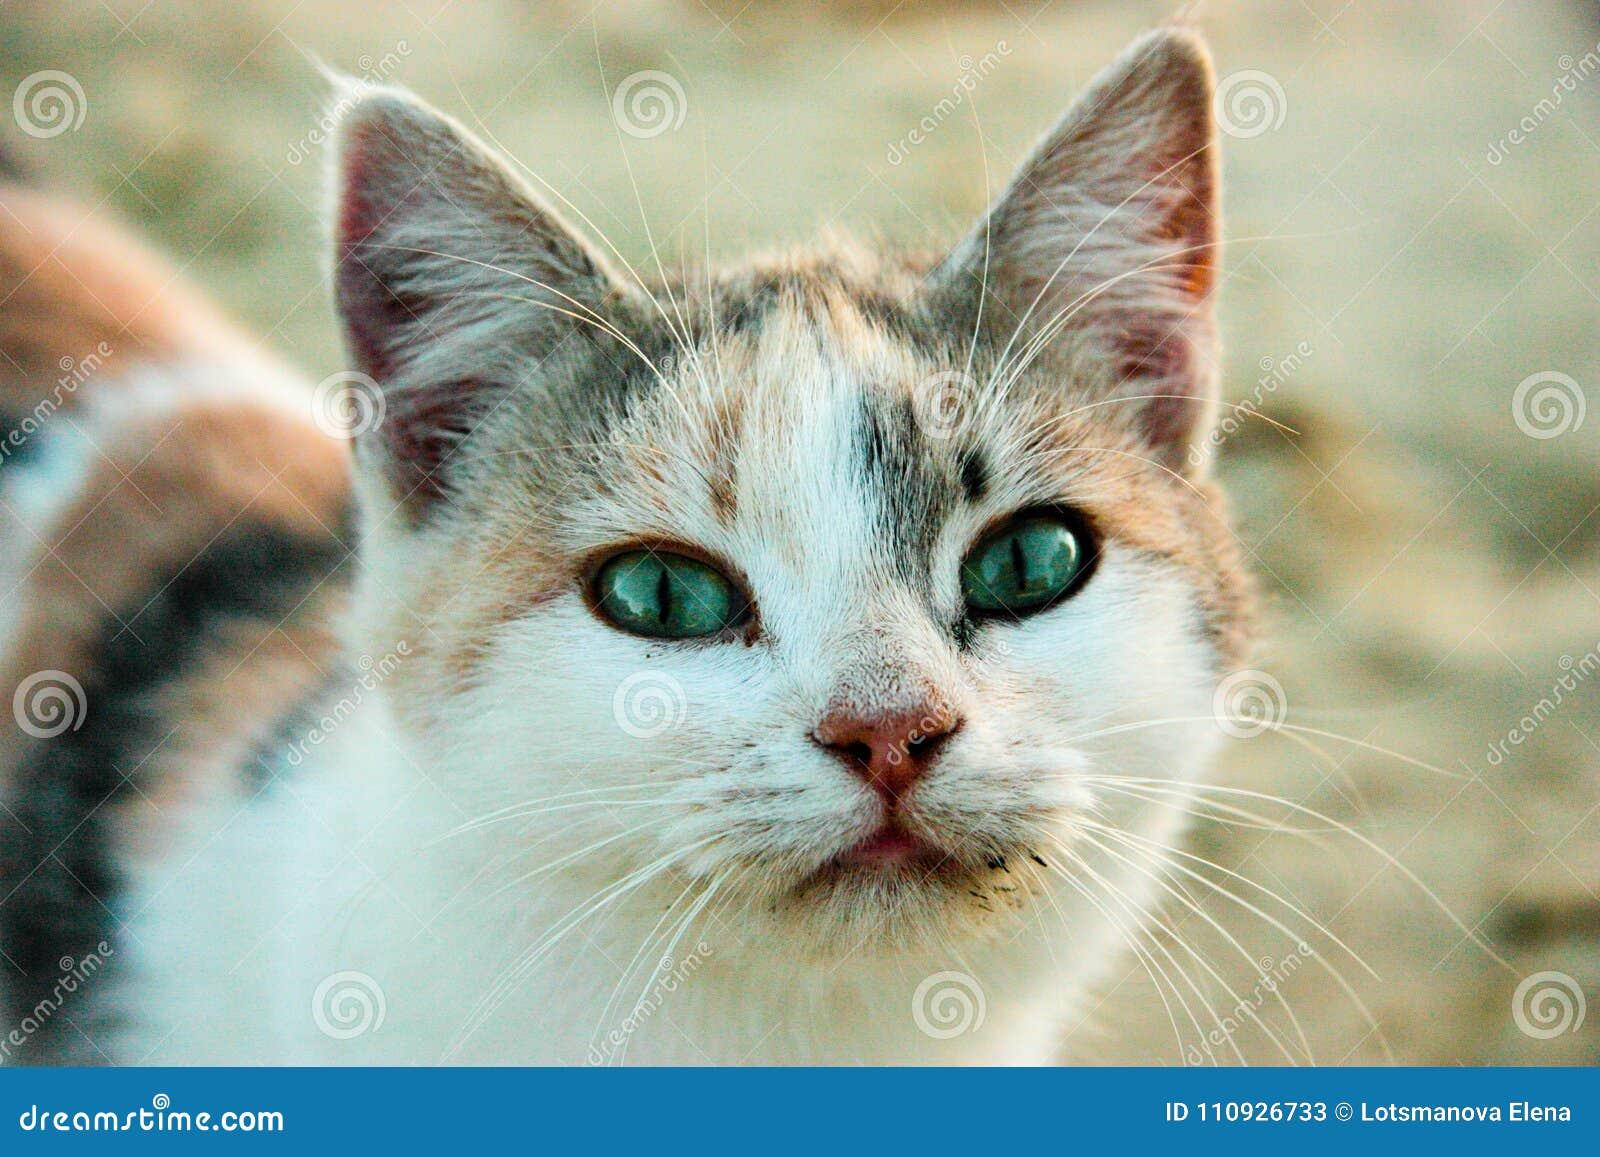 Dreifarbige einzige Katze